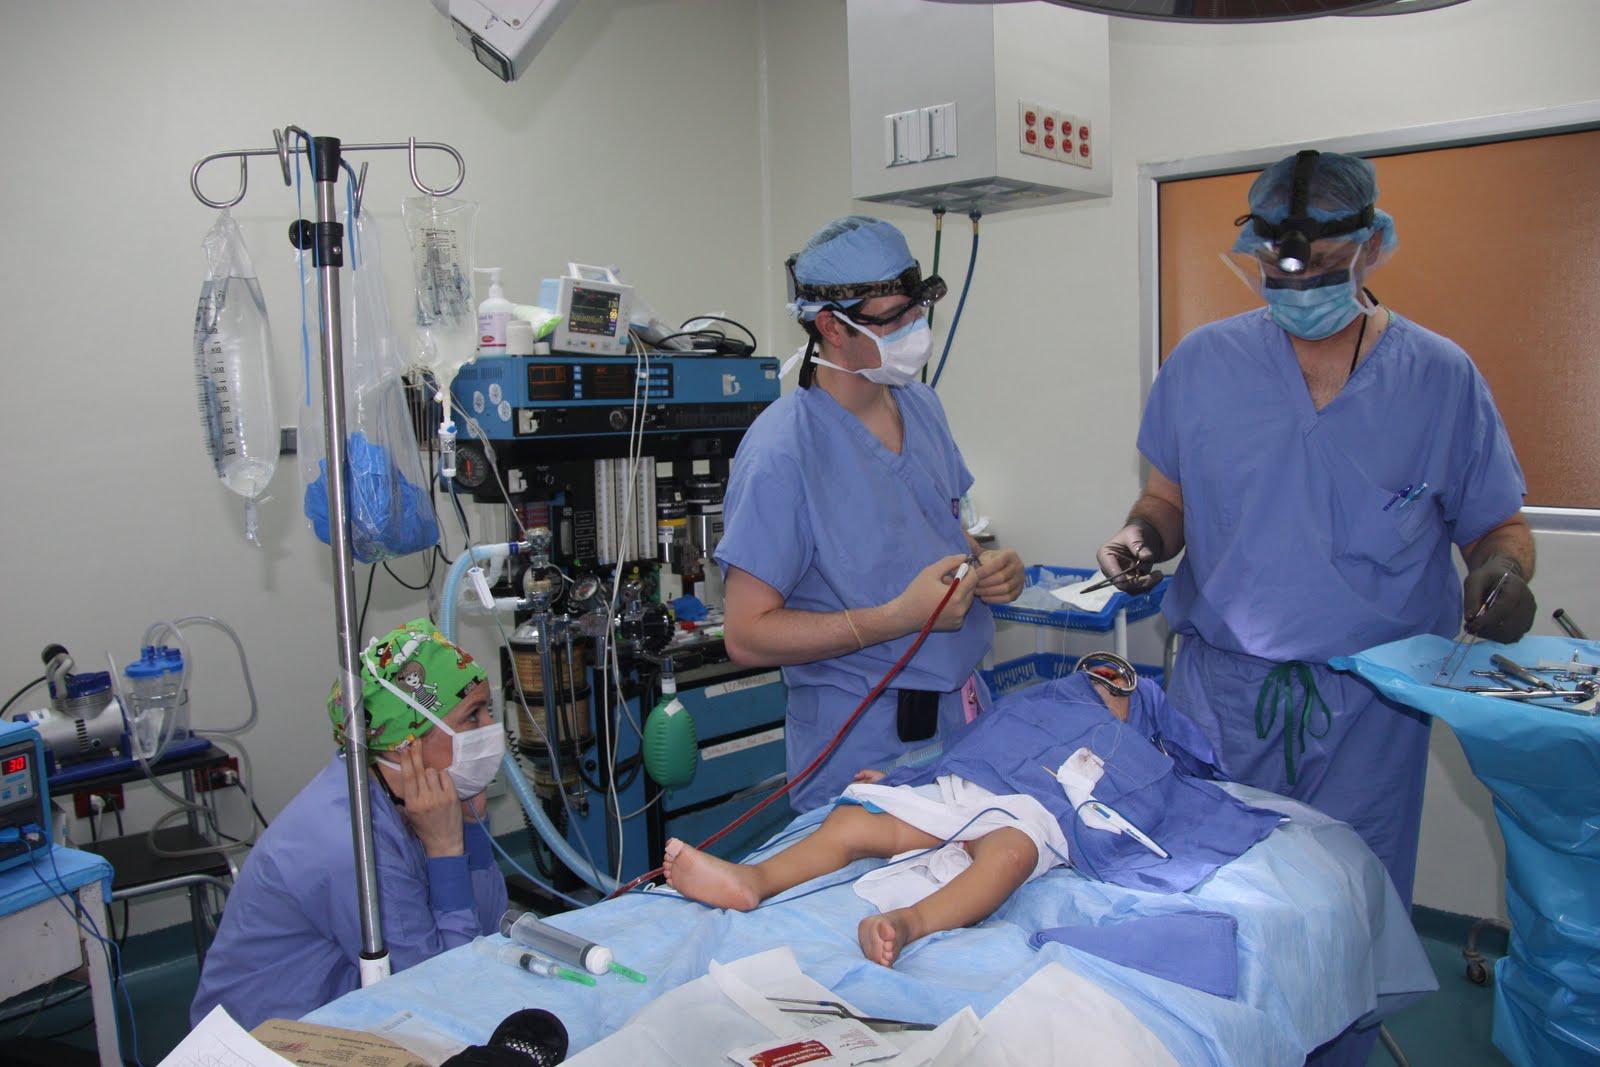 Teresa Searcy And Smart Medical Teams In Honduras April 8